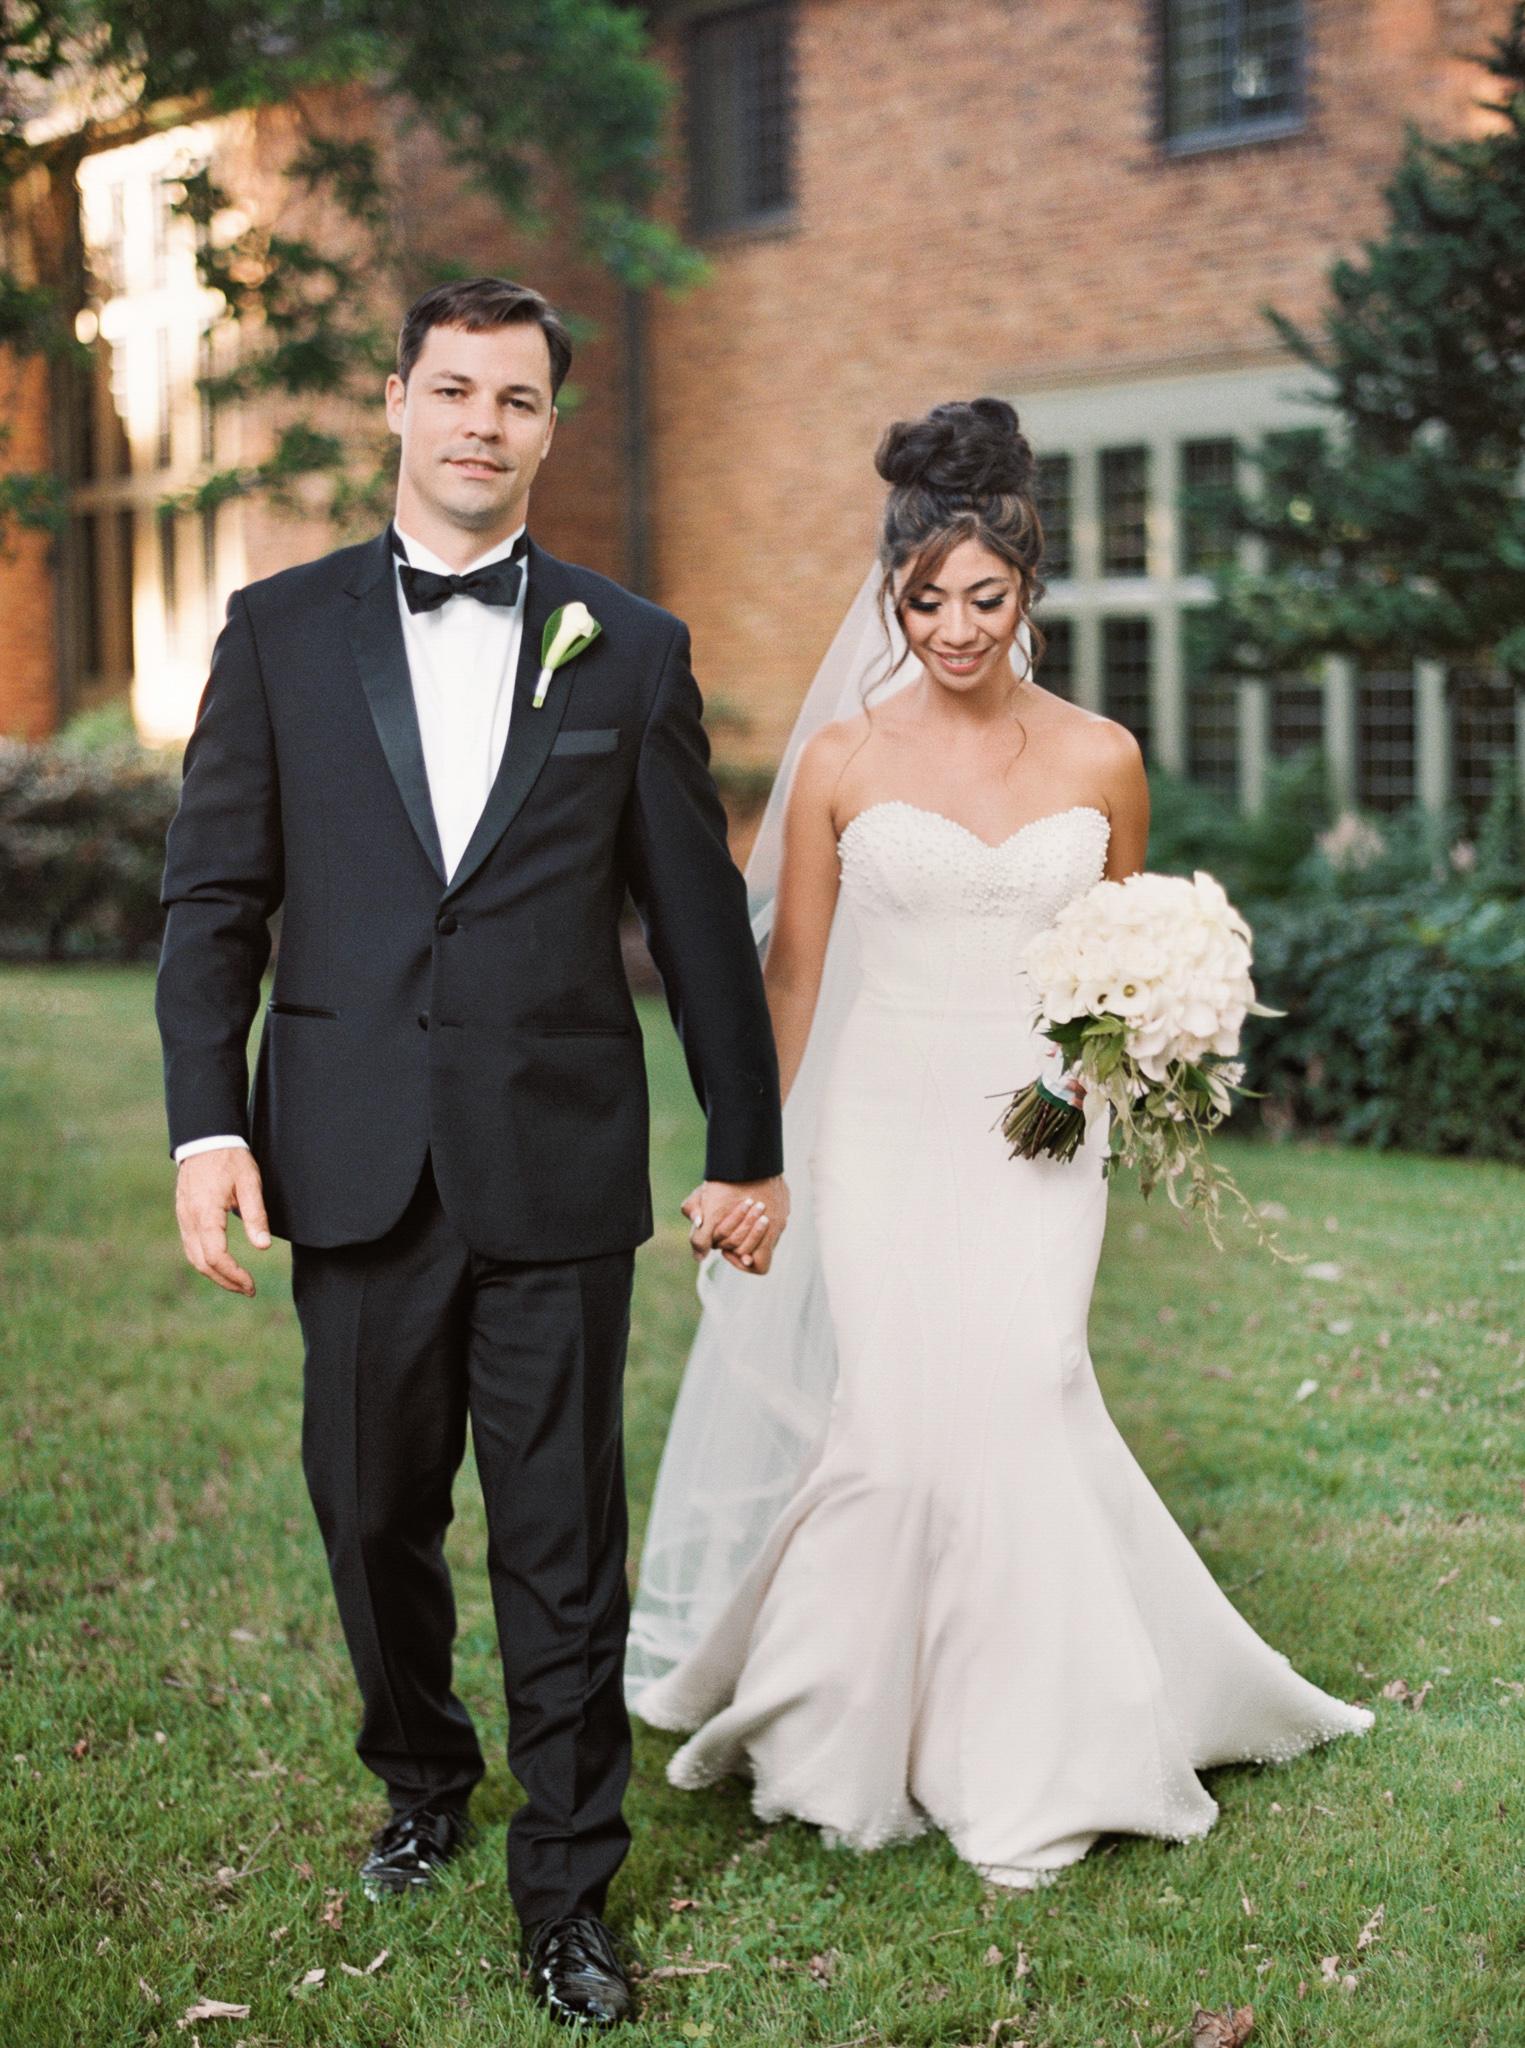 096OutliveCreative_Travel_Photographer_Videographer_Lewis&Clark_Oregon_Elegant_BlackTie_Destination_Wedding.jpg